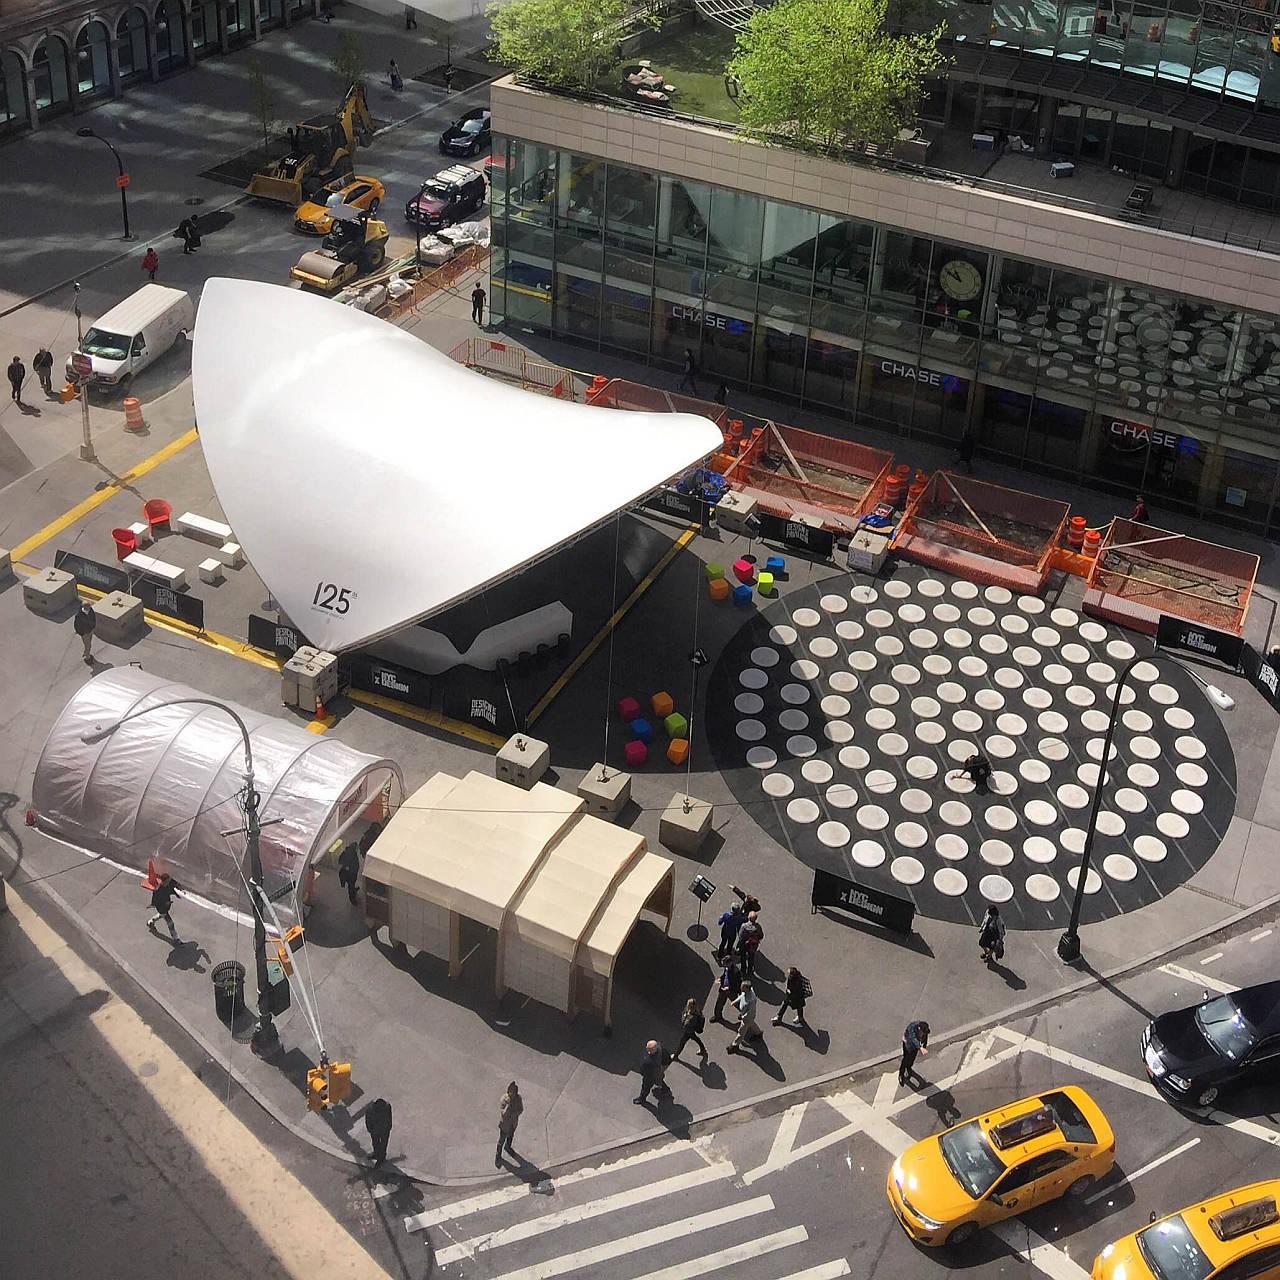 Design Pavilion 2016 en Cooper Square Aerial View : Photo courtesy of © Susan Grant Lewin Associates